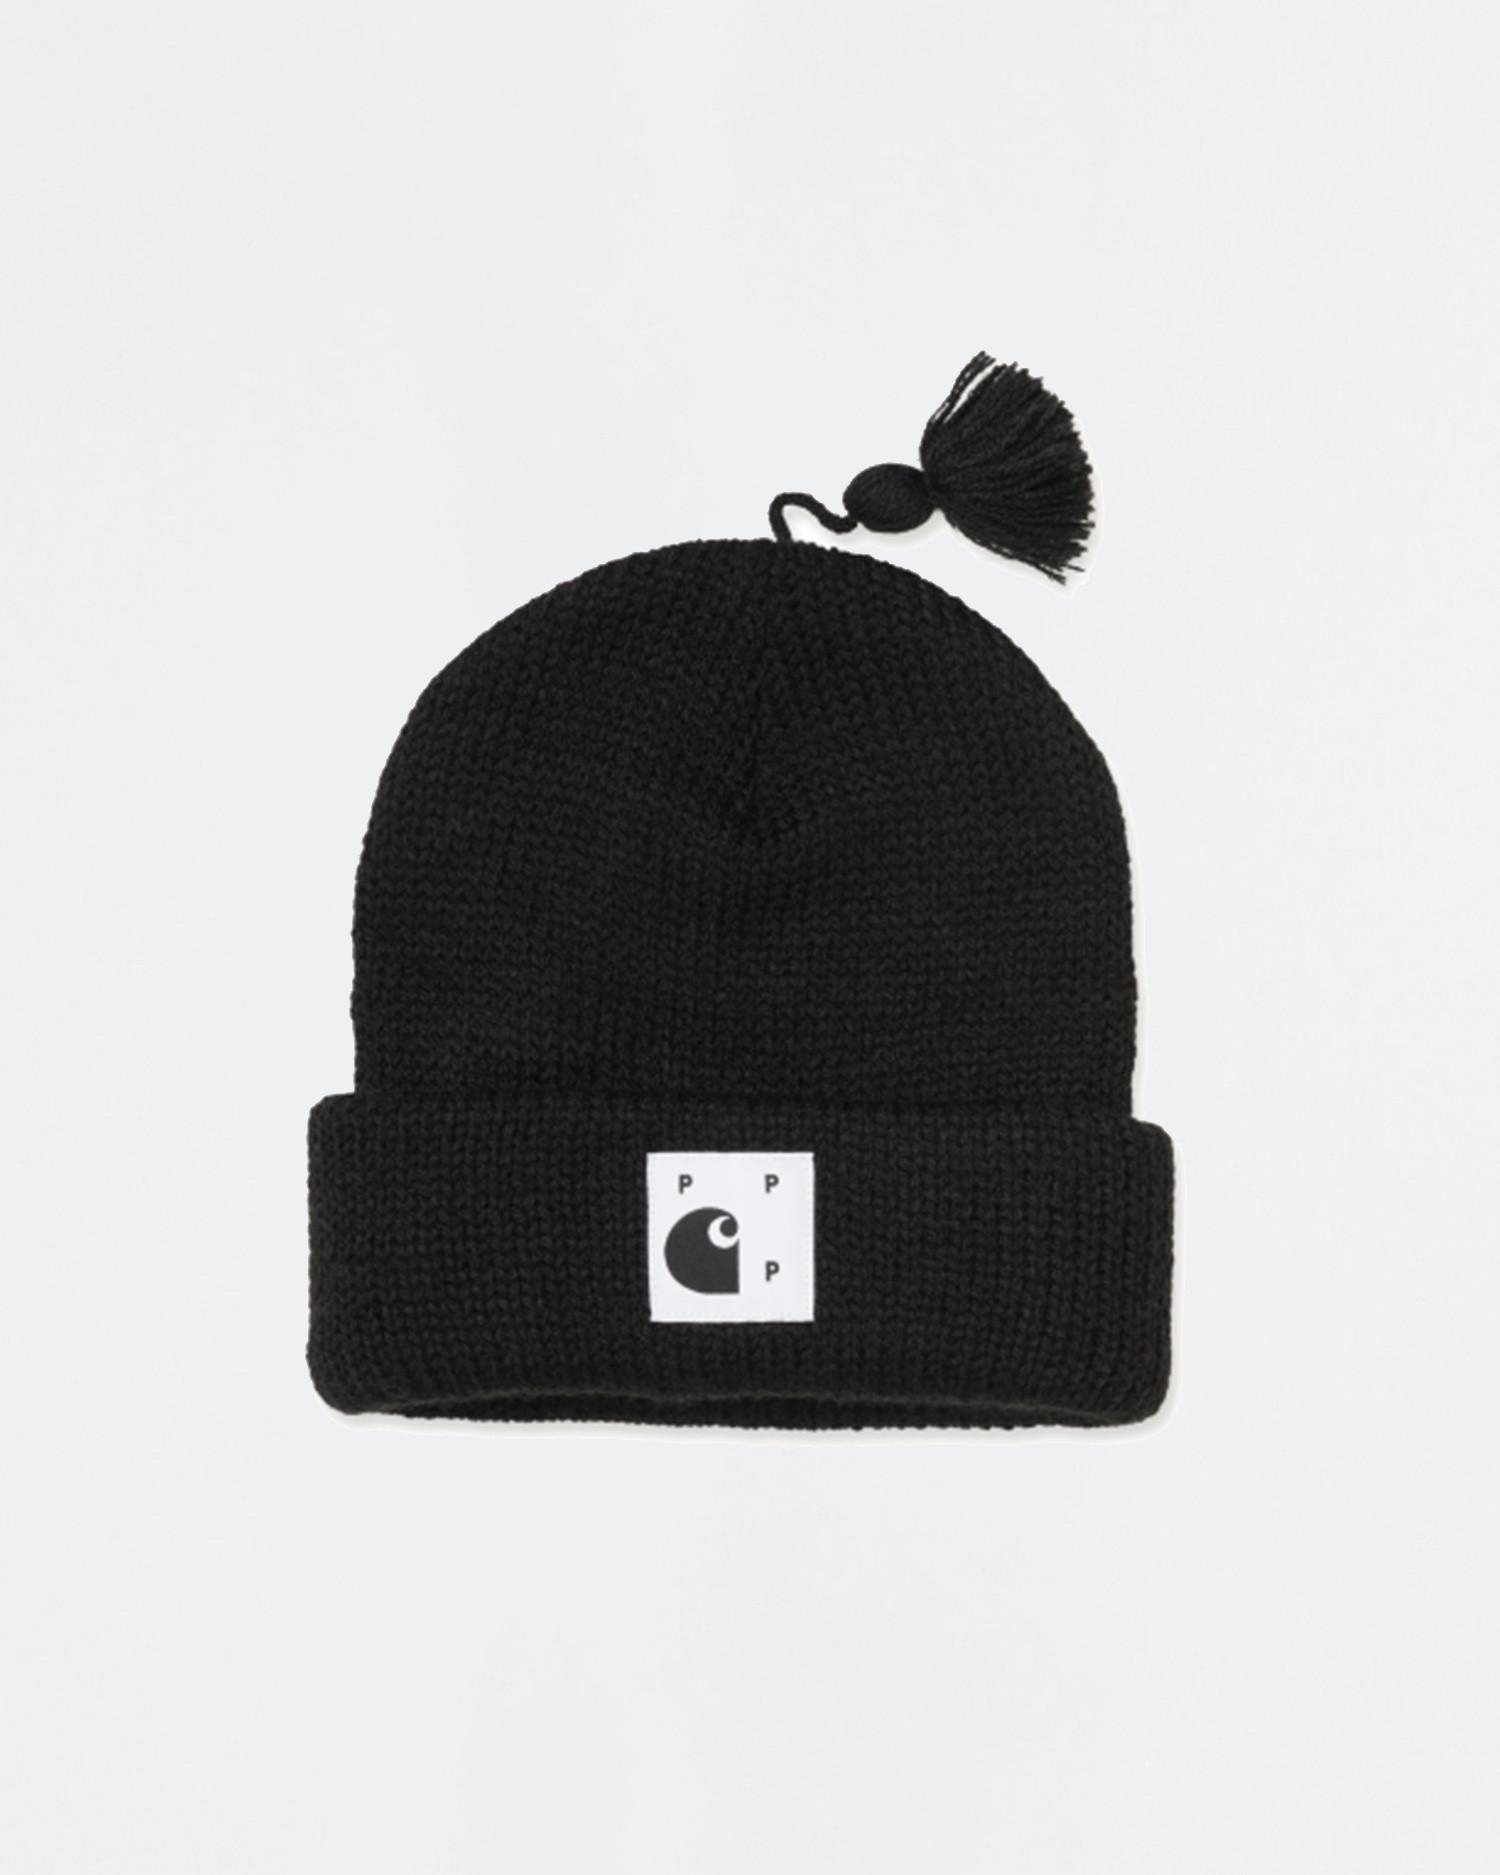 Carhartt x Pop Trading Co Watch Hat Black